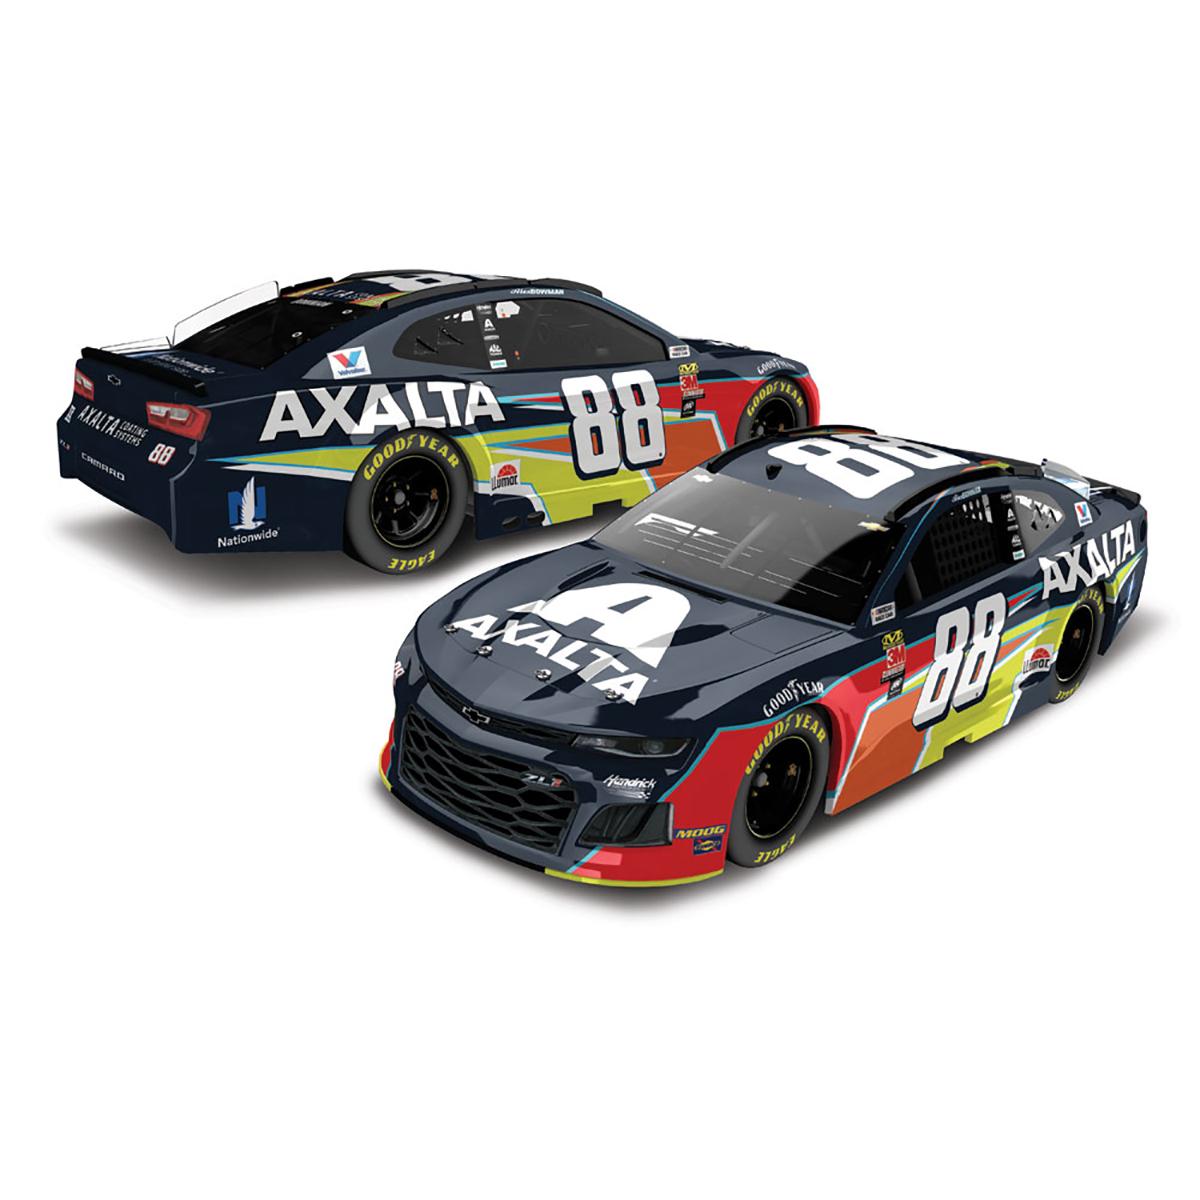 Alex Bowman #88 2019 NASCAR Axalta 1:64 Die-Cast